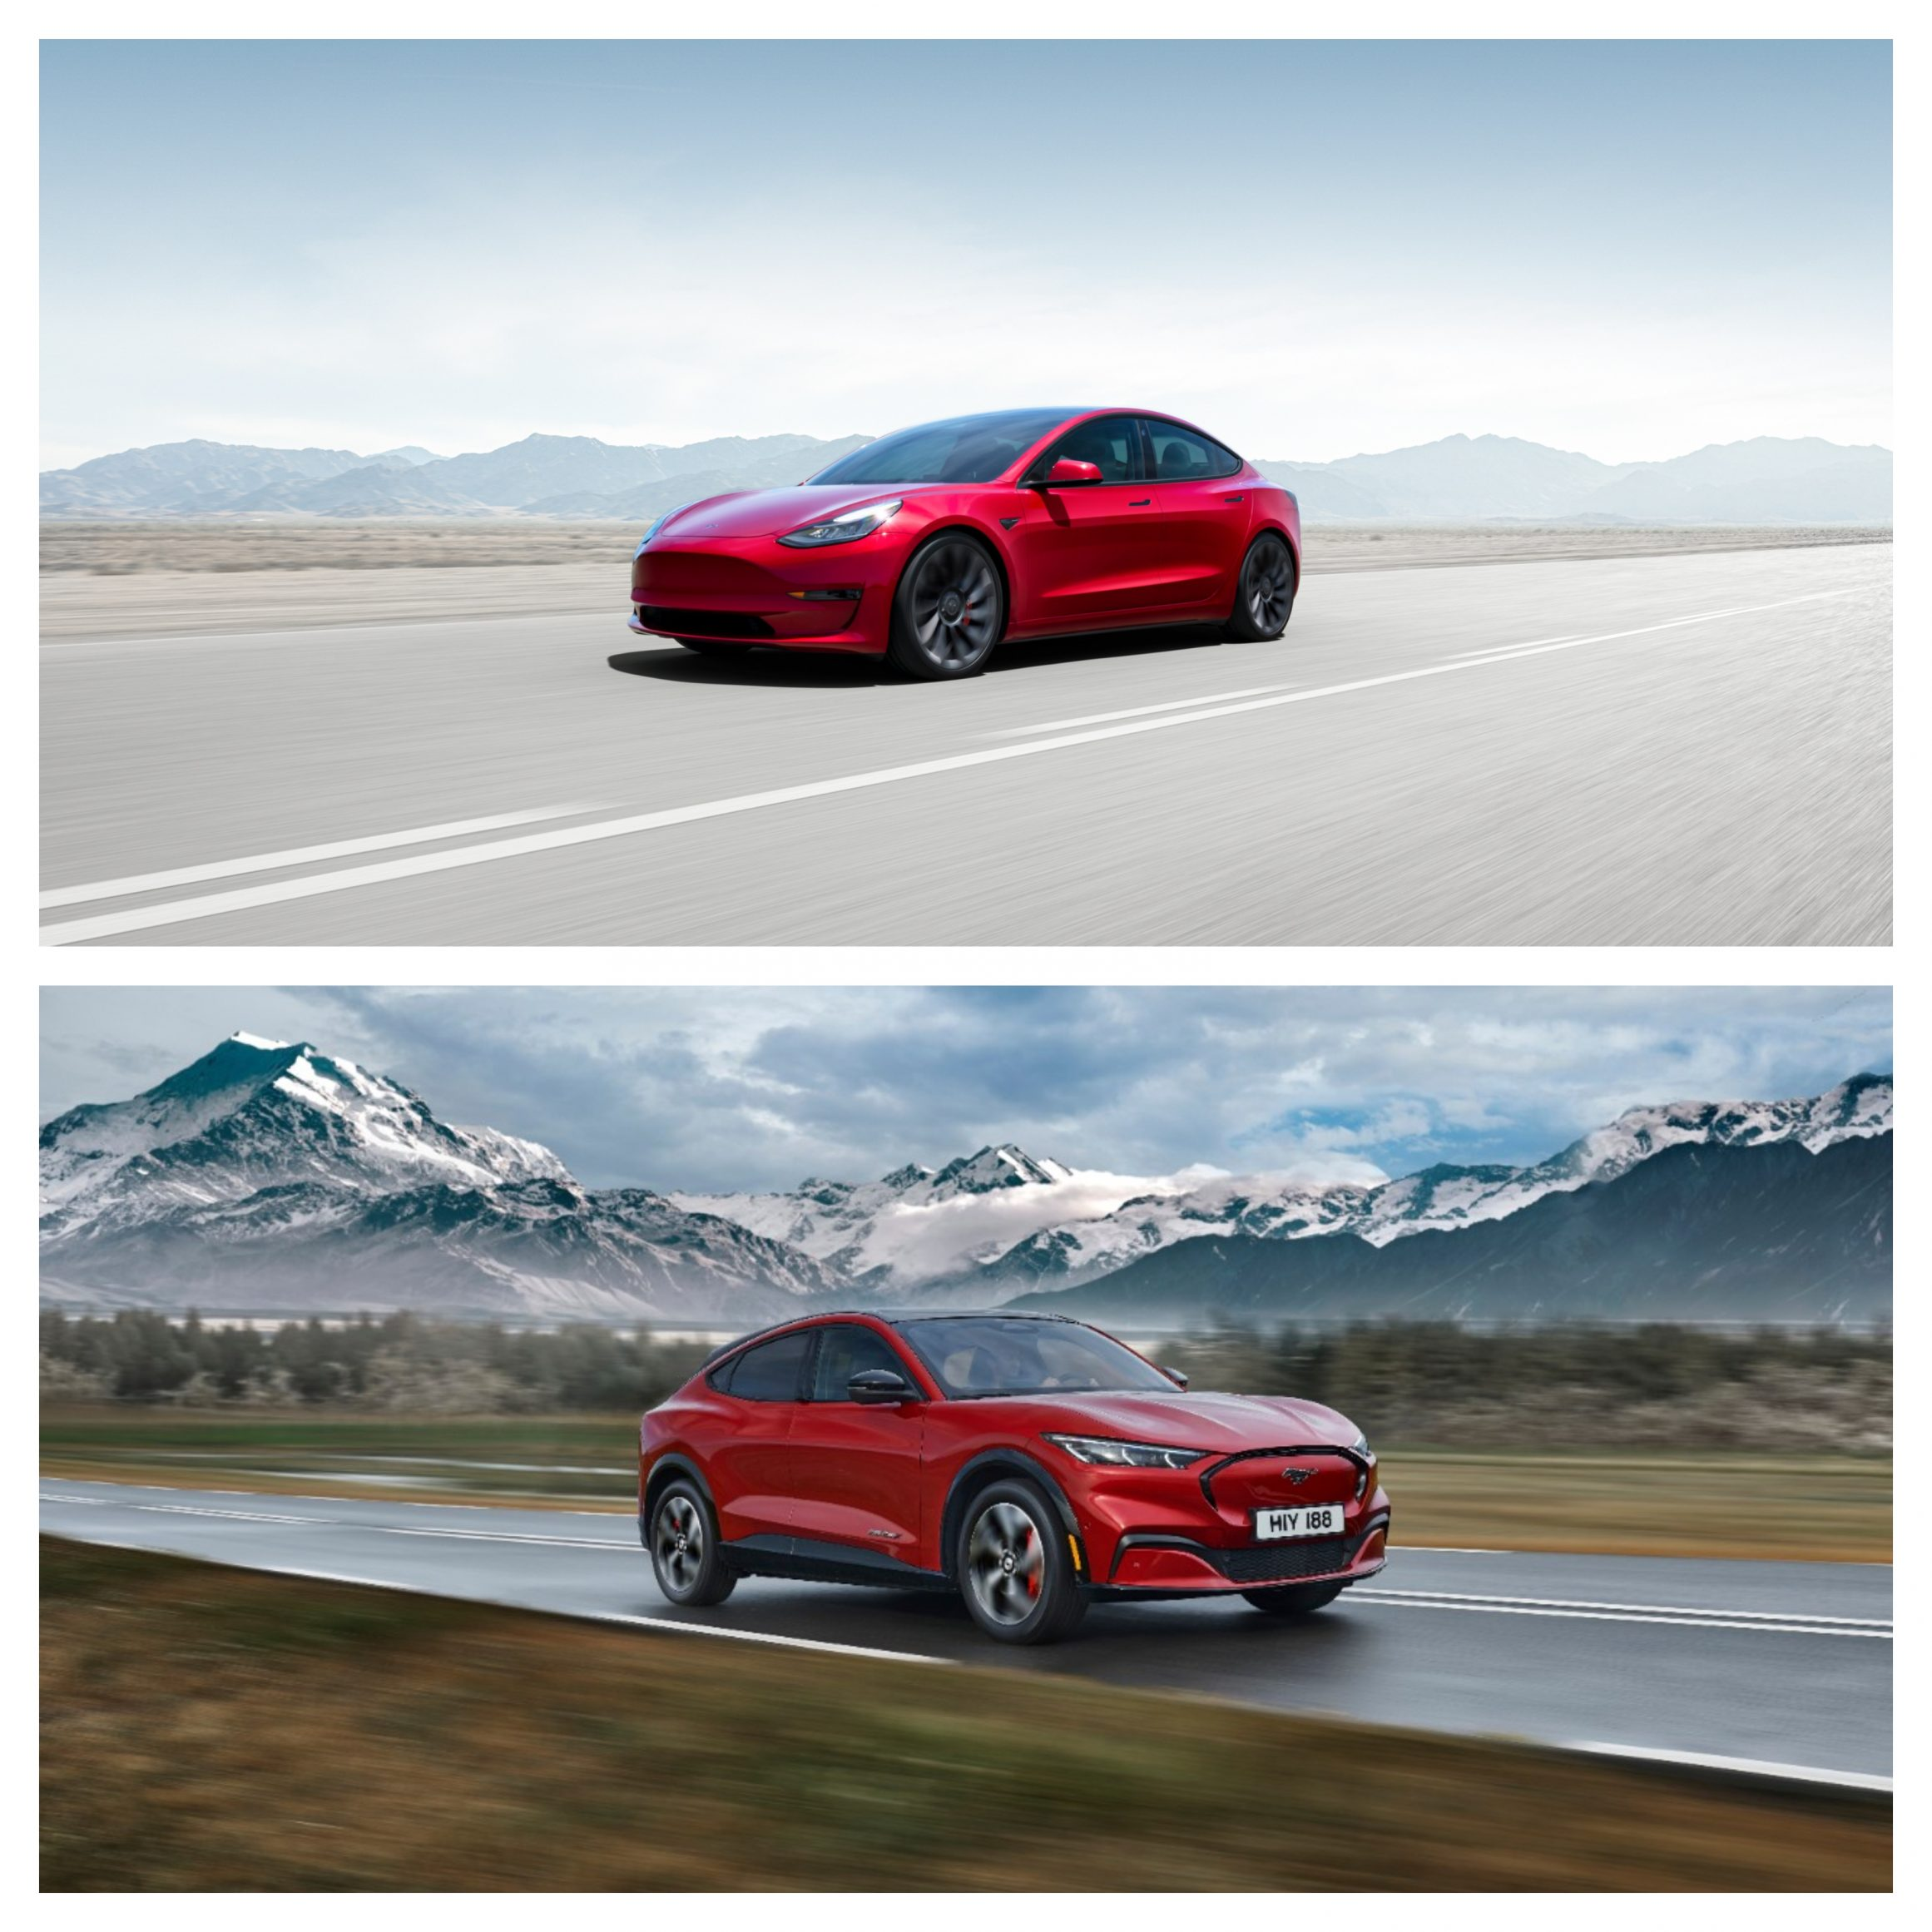 Tesla Model 3 Vs Ford Mustang Mach-E - design